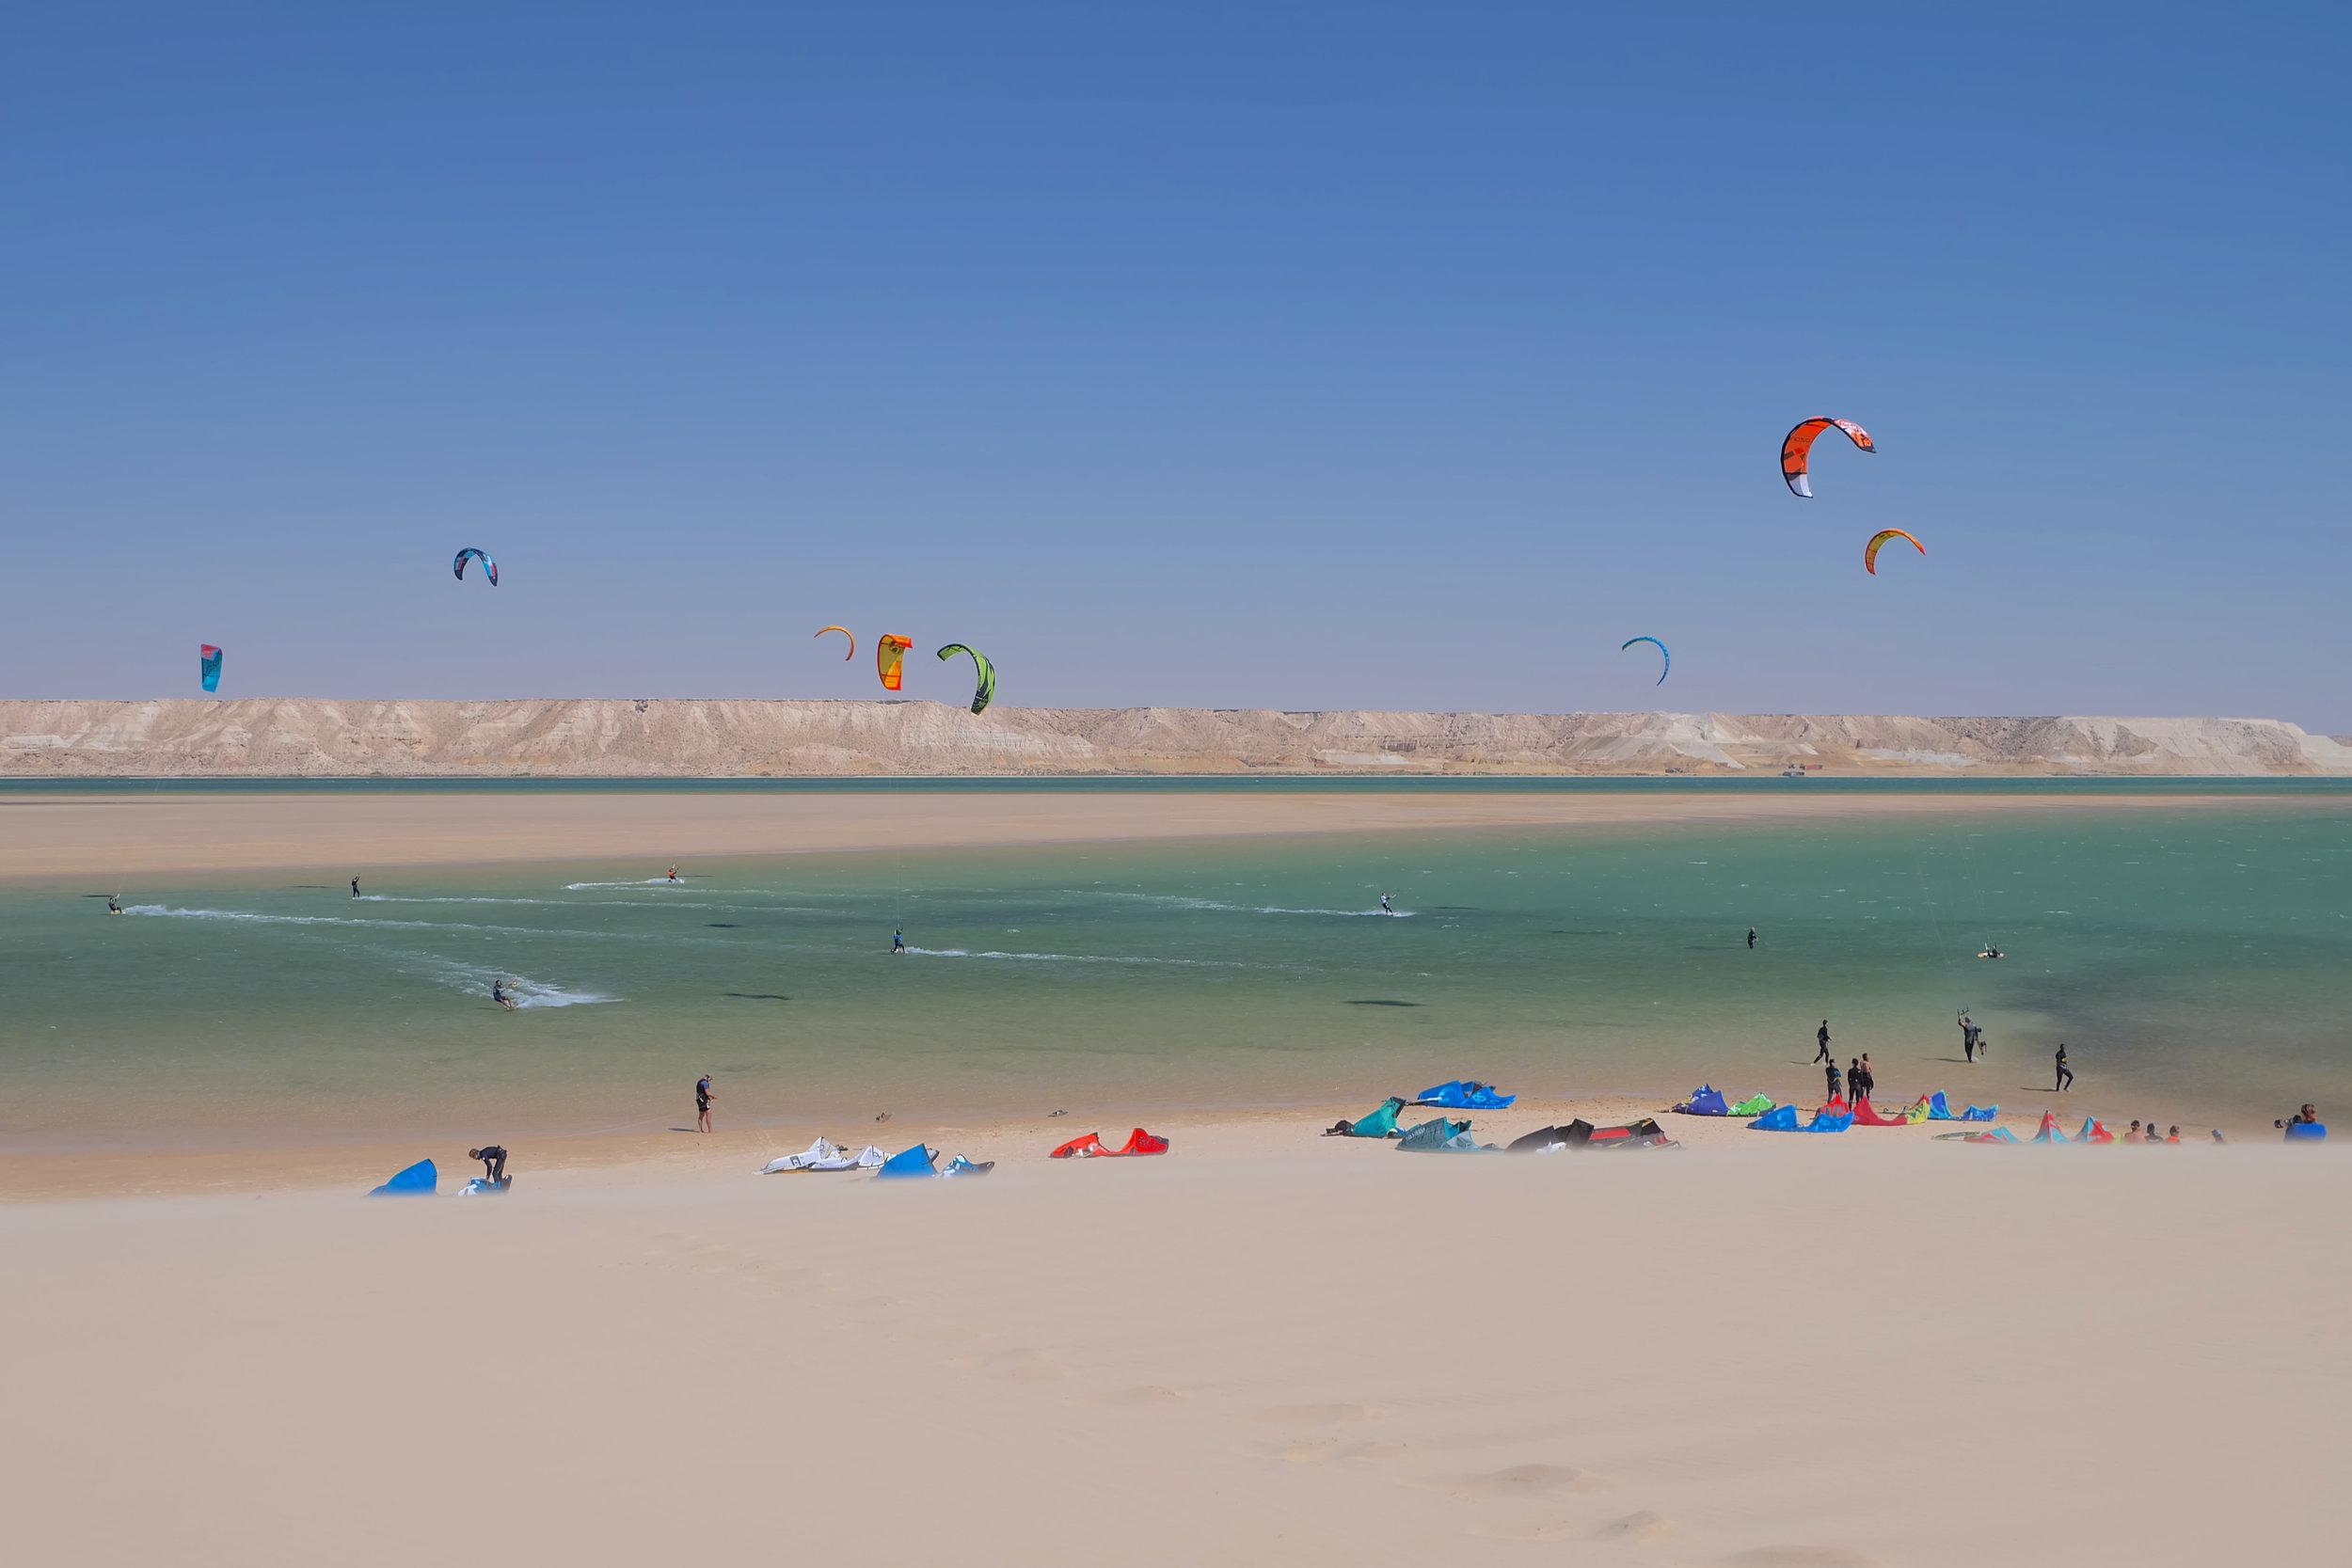 Kitesurf white dune Dakhla - Morocco.JPG